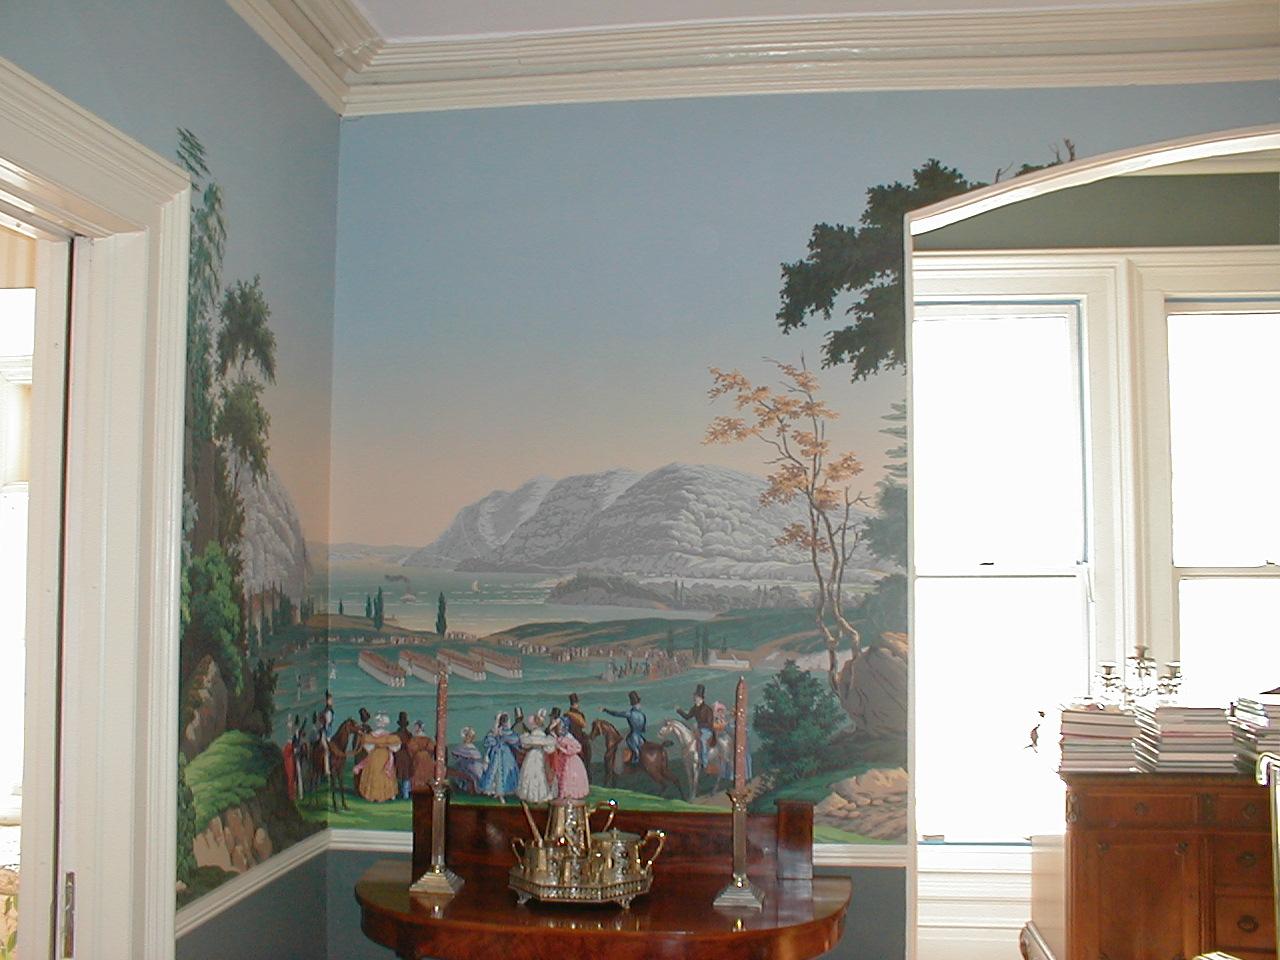 Original installation